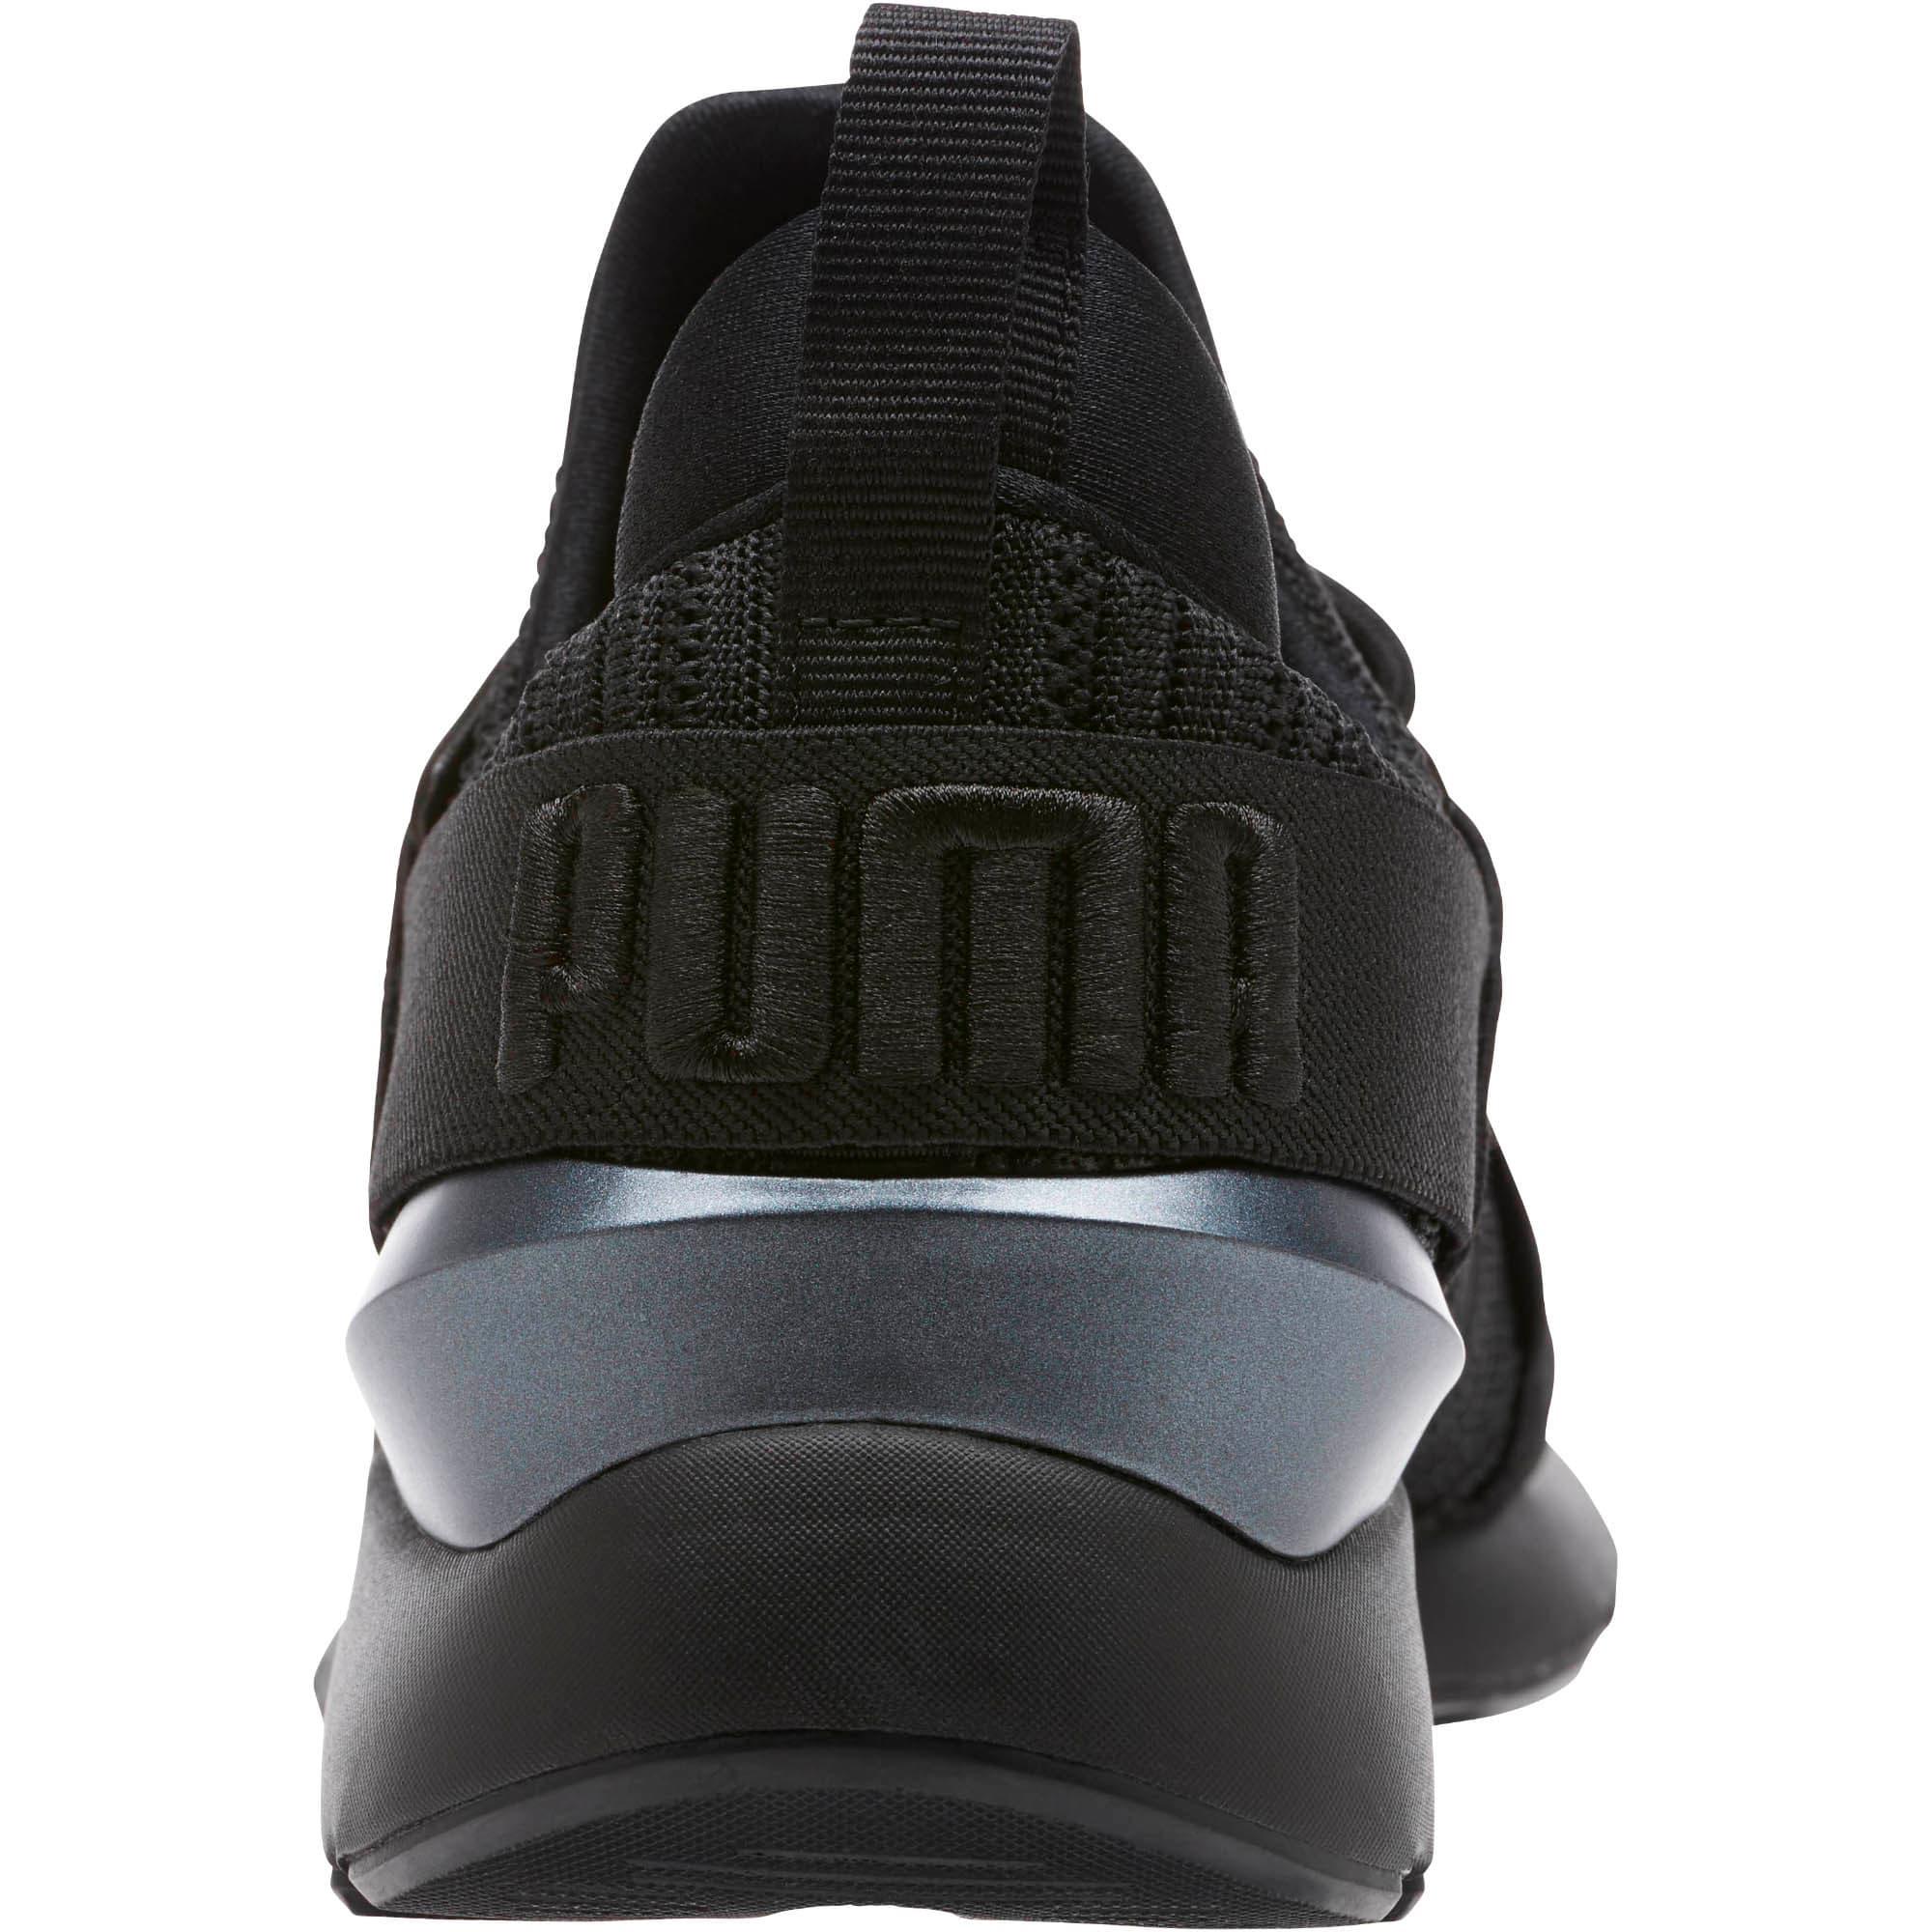 Thumbnail 4 of Muse Knit Women's Sneakers, Iron Gate-Puma Black, medium